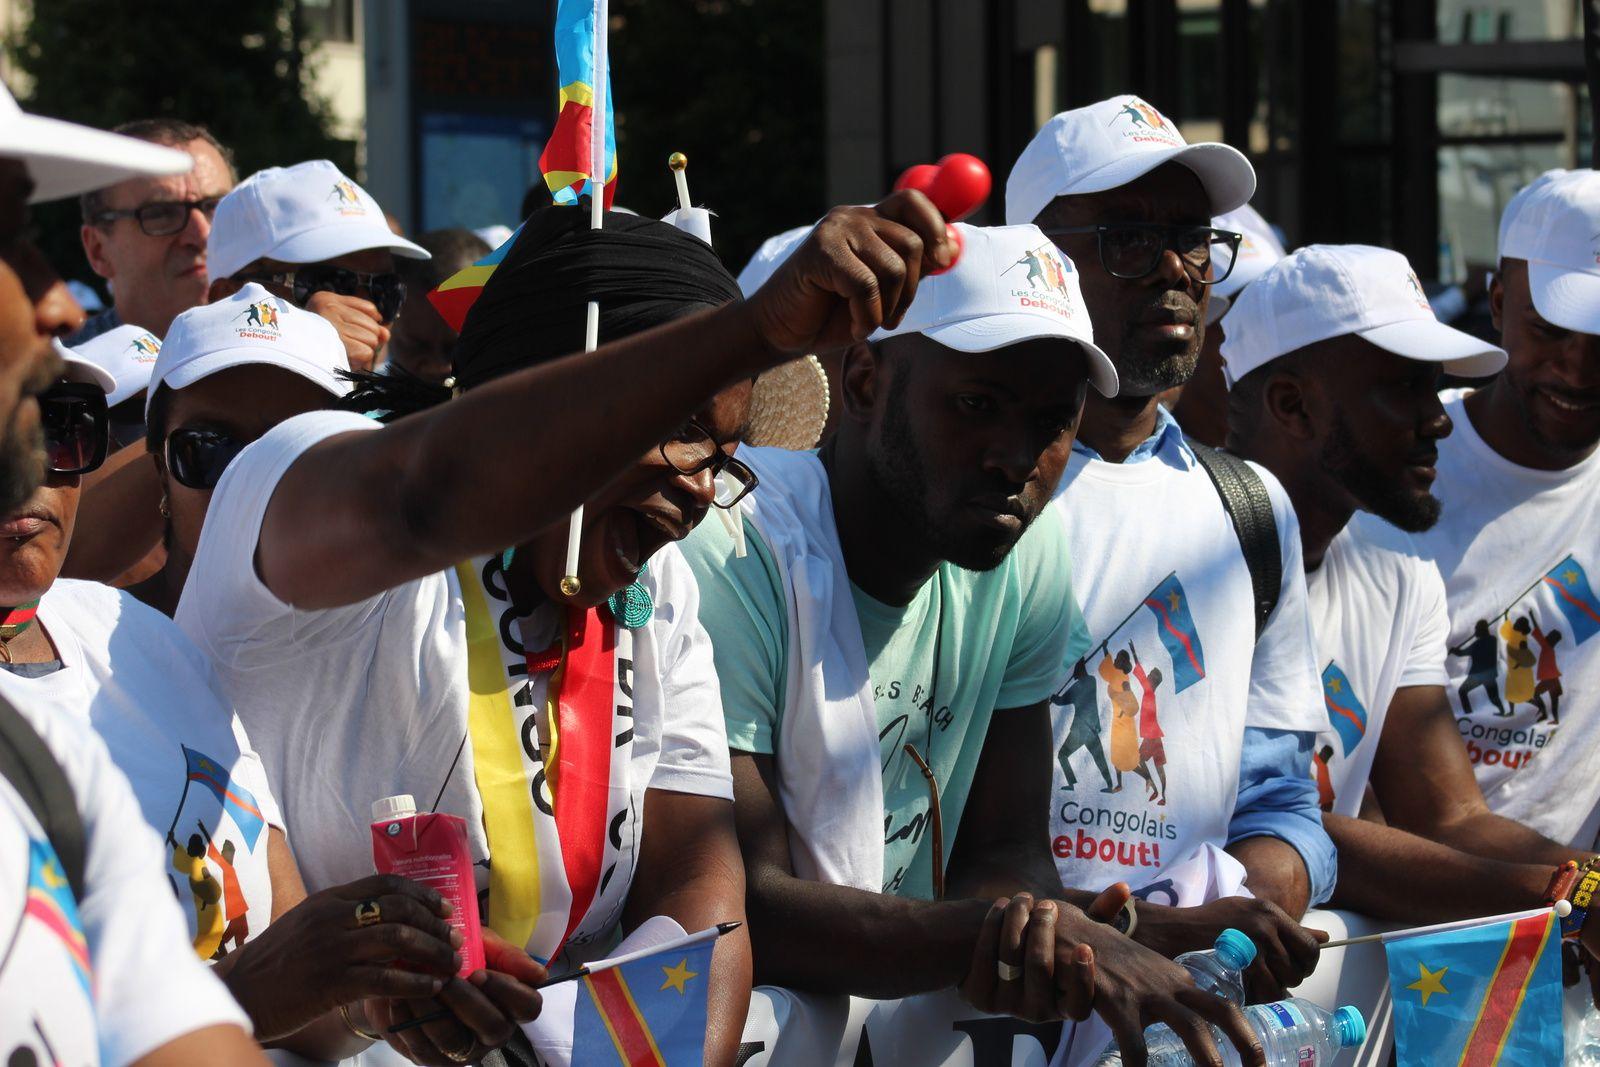 Bruxelles. Sindika Dokolo promet au clan Kabila des «frappes chirurgicales»